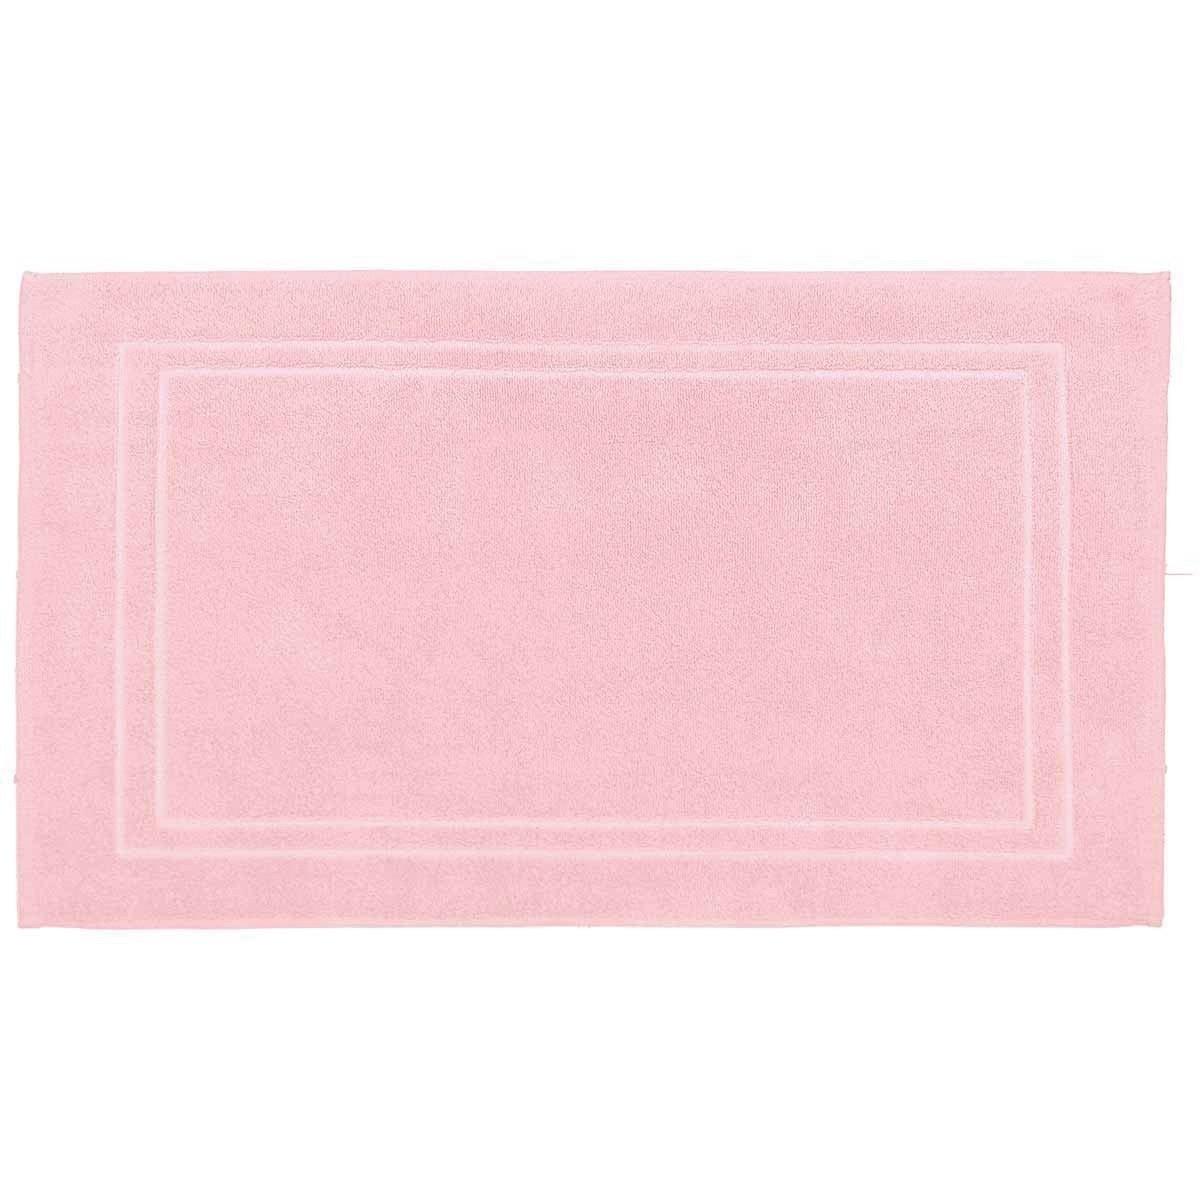 Tapis de bain 900gr/m²  Rose 50x80 cm